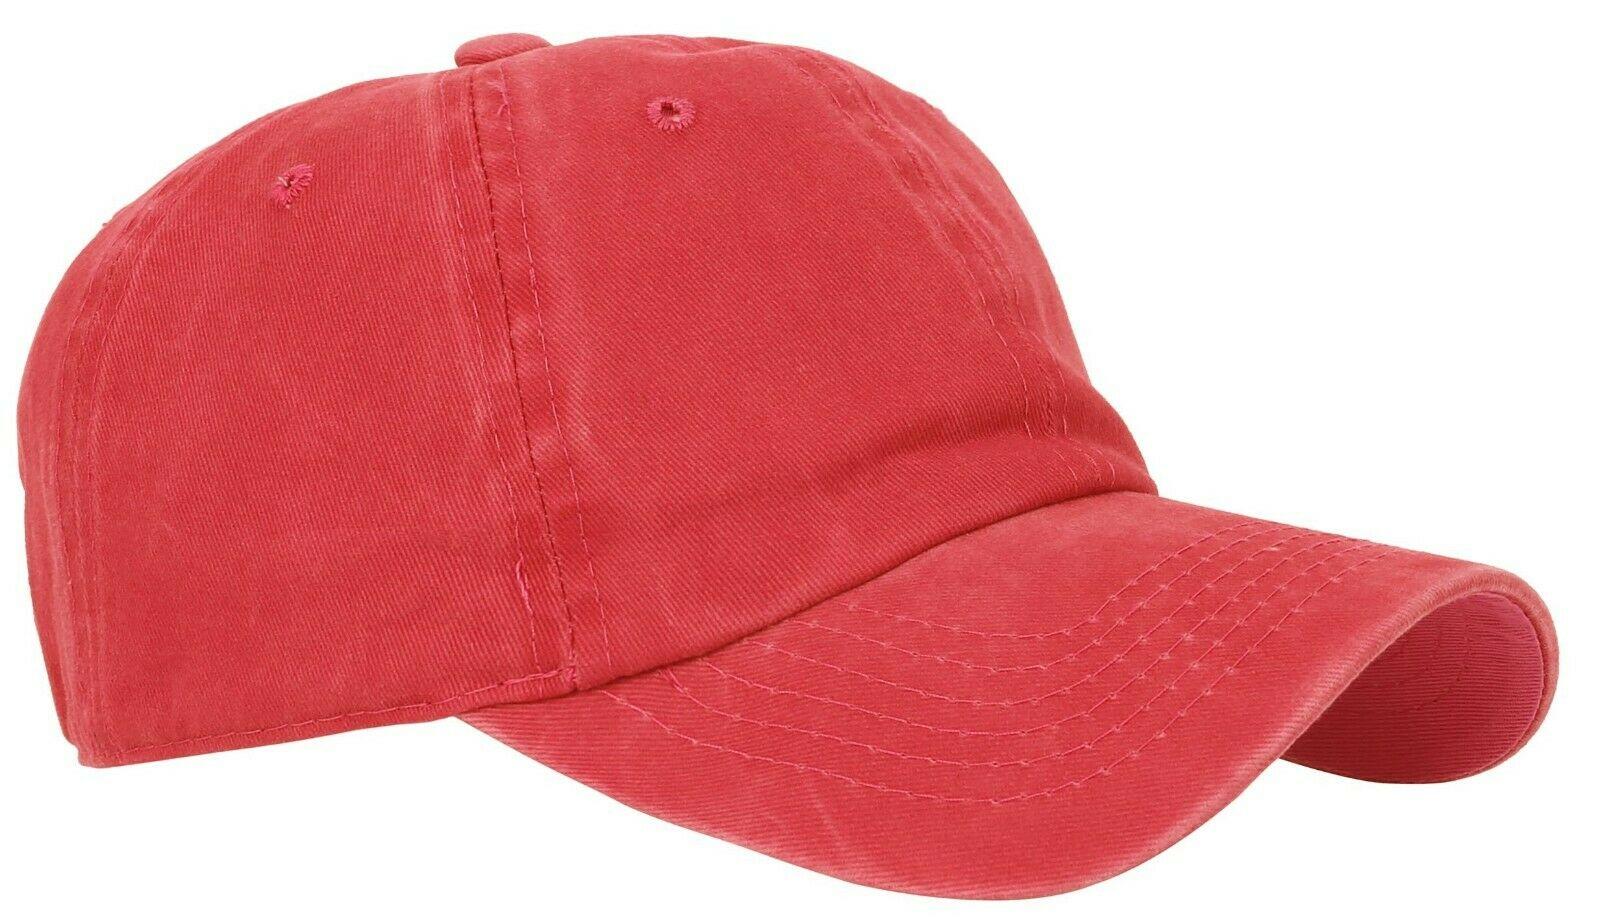 BASEBALL-CAP-Plain-Dad-Hat-Low-Profile-Vintage-Washed-Pigment-Adjustable thumbnail 15